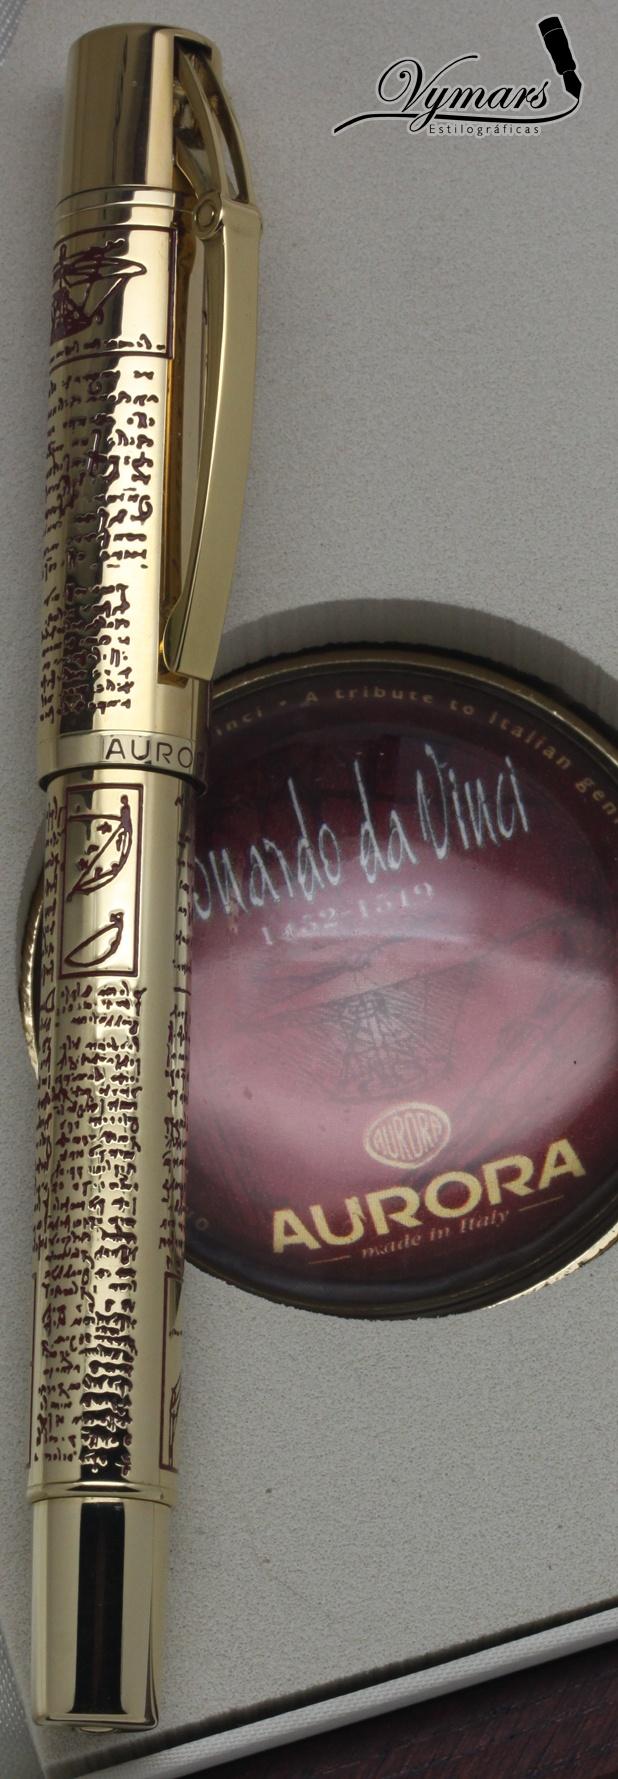 Aurora Leonardo Da Vinci - write out your dreams... Don't forget a dreamy card too. http://personalise.colorblindcards.com/